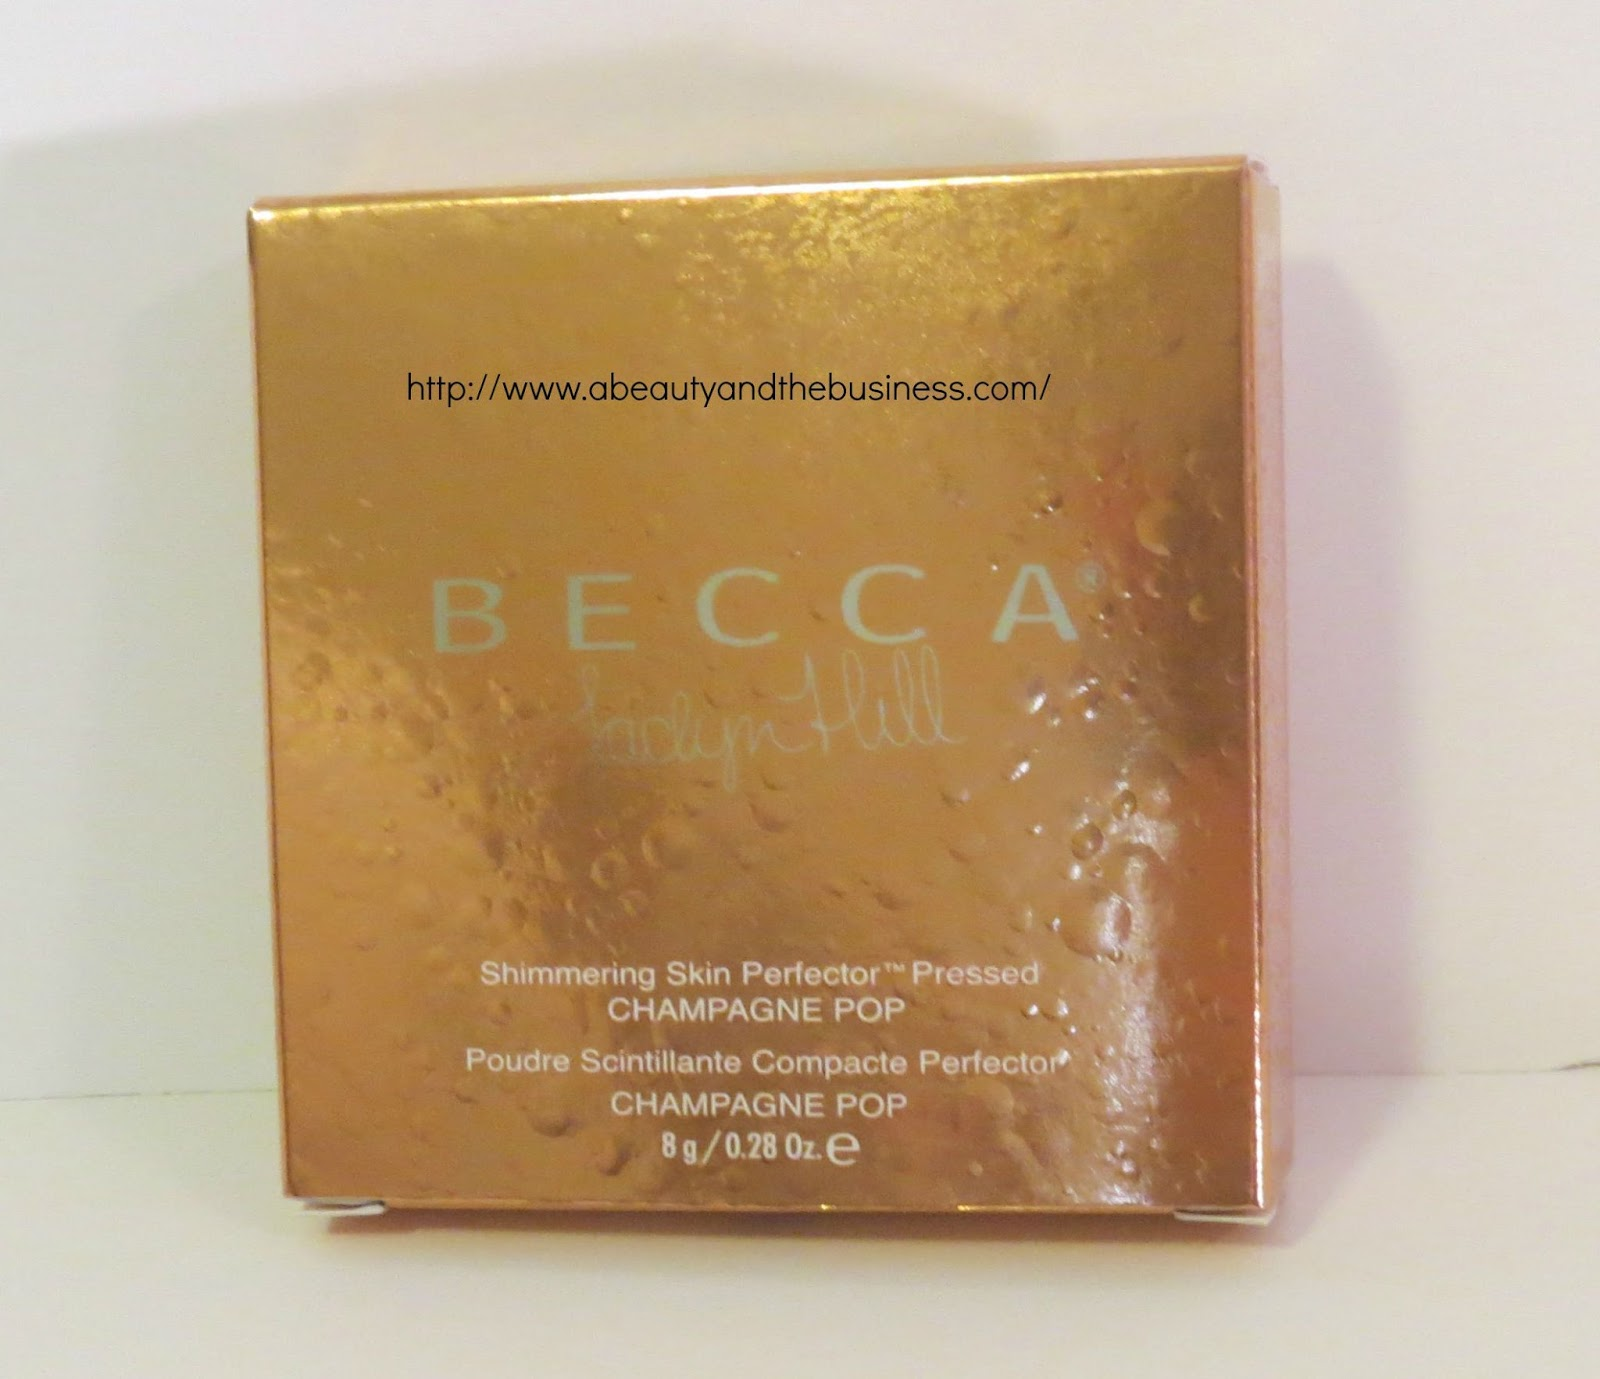 sephora haul, sephora vib rouge, sephora rouge beauty before brunch, cover fx foundation, laura mercier flawless fluide shell, becca champagne pop